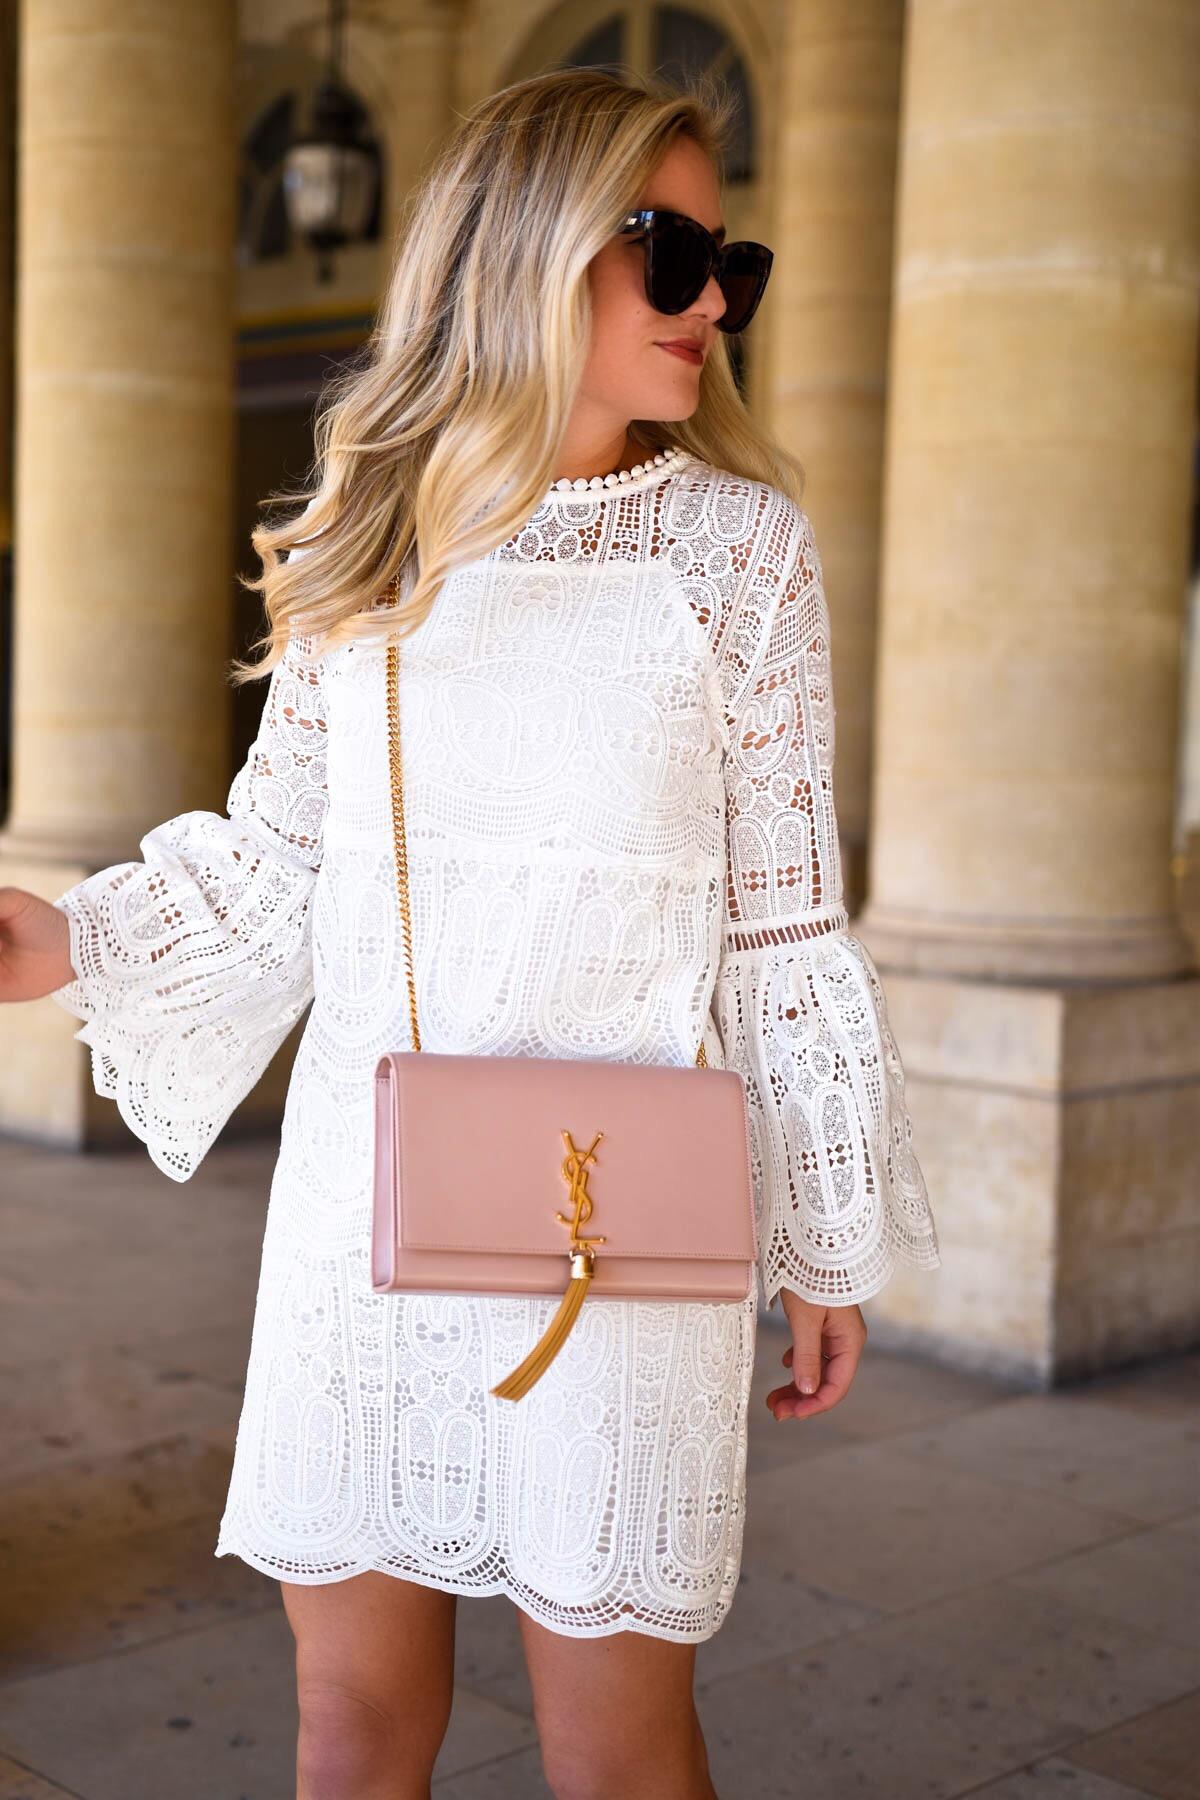 White-Lace-Dress, Bell-Sleeve-Dress, YSL-Handbag, Saint-Laurent-Handbag, Tassel-Bag, Chicwish-Dress